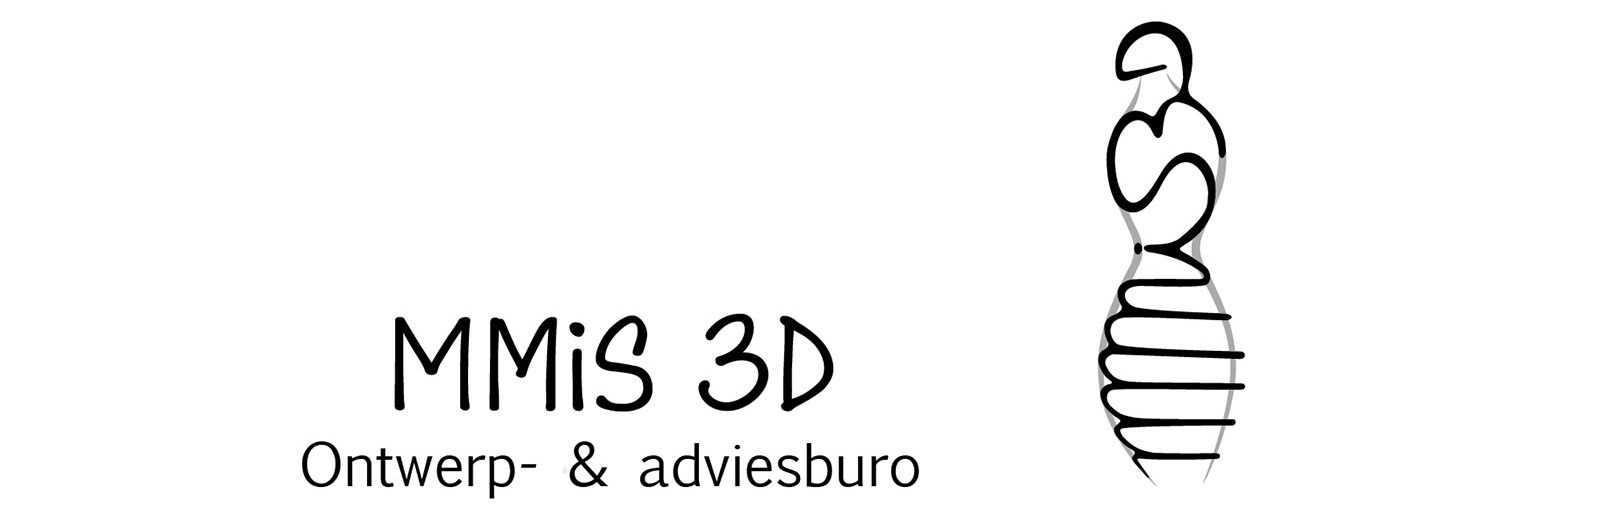 MMiS 3D